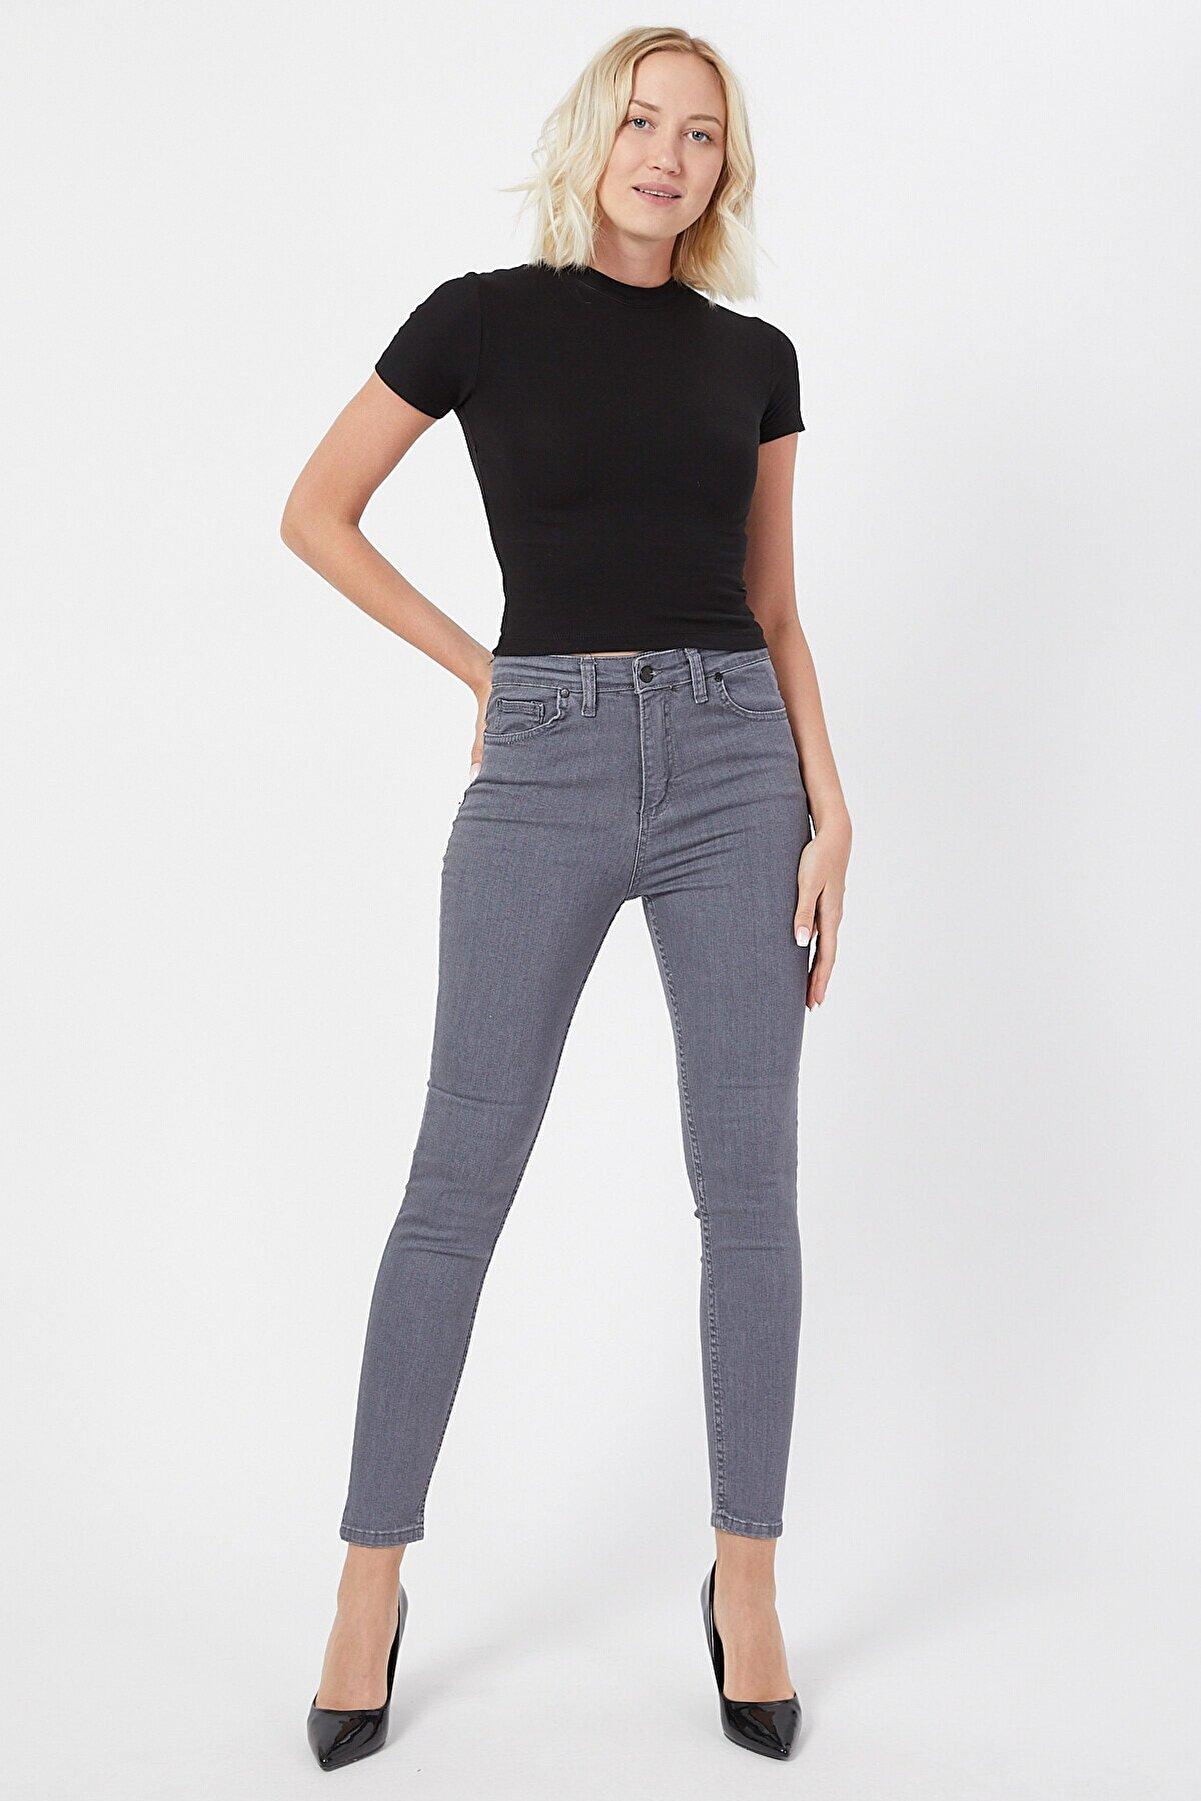 VAV Kadın Gri  Dar Paça Yüksek Bel Kot Pantolon